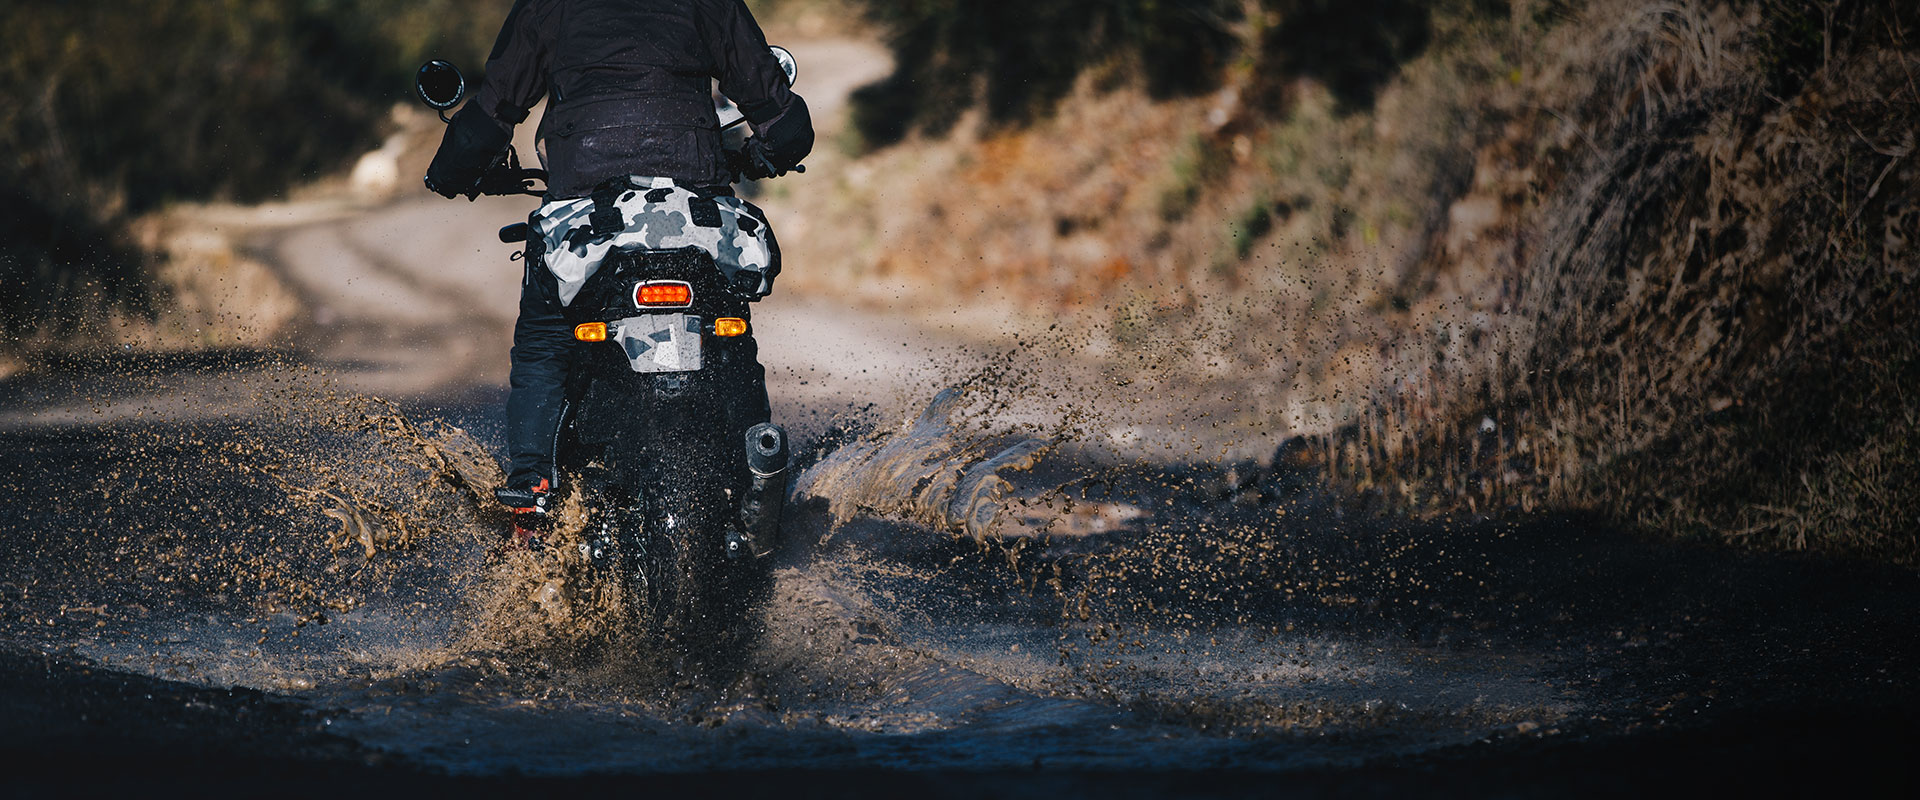 Royal Enfield Himalayan riding through water